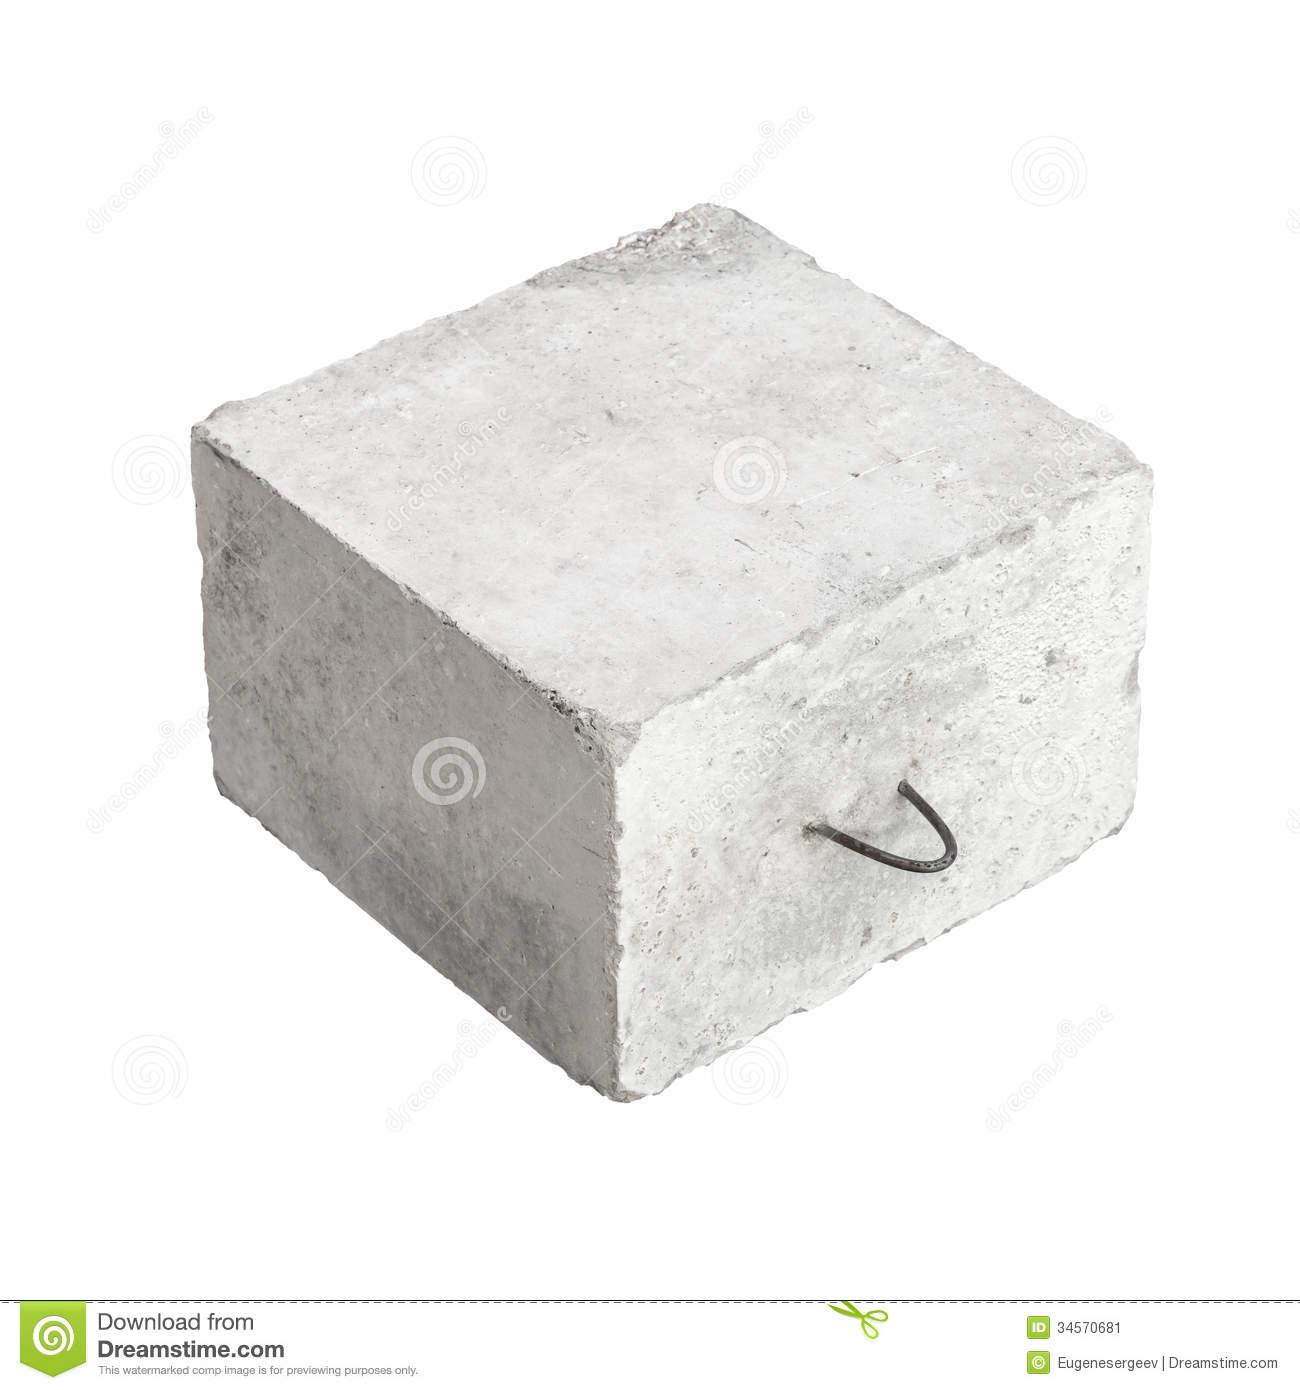 Concrete block clipart jpg free stock Big Concrete Block Texture Stock Photo - Image: 39585187 jpg free stock